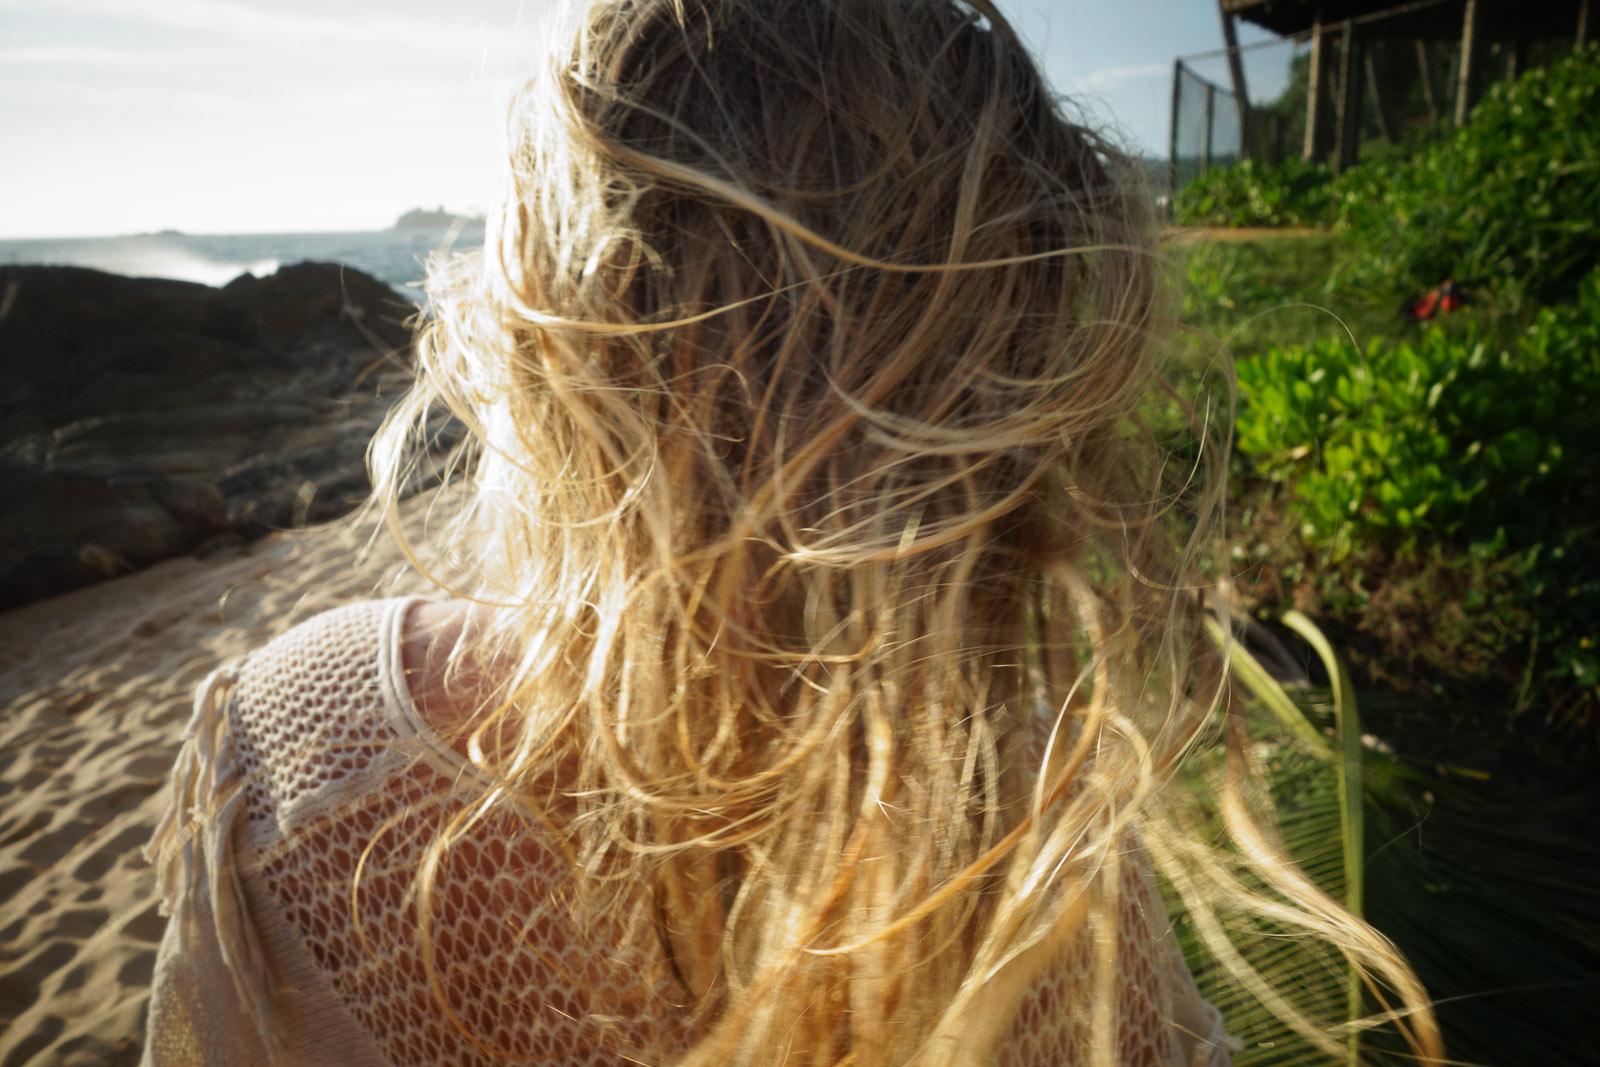 Sunshinestories-surf-travel-blog-DSC03327